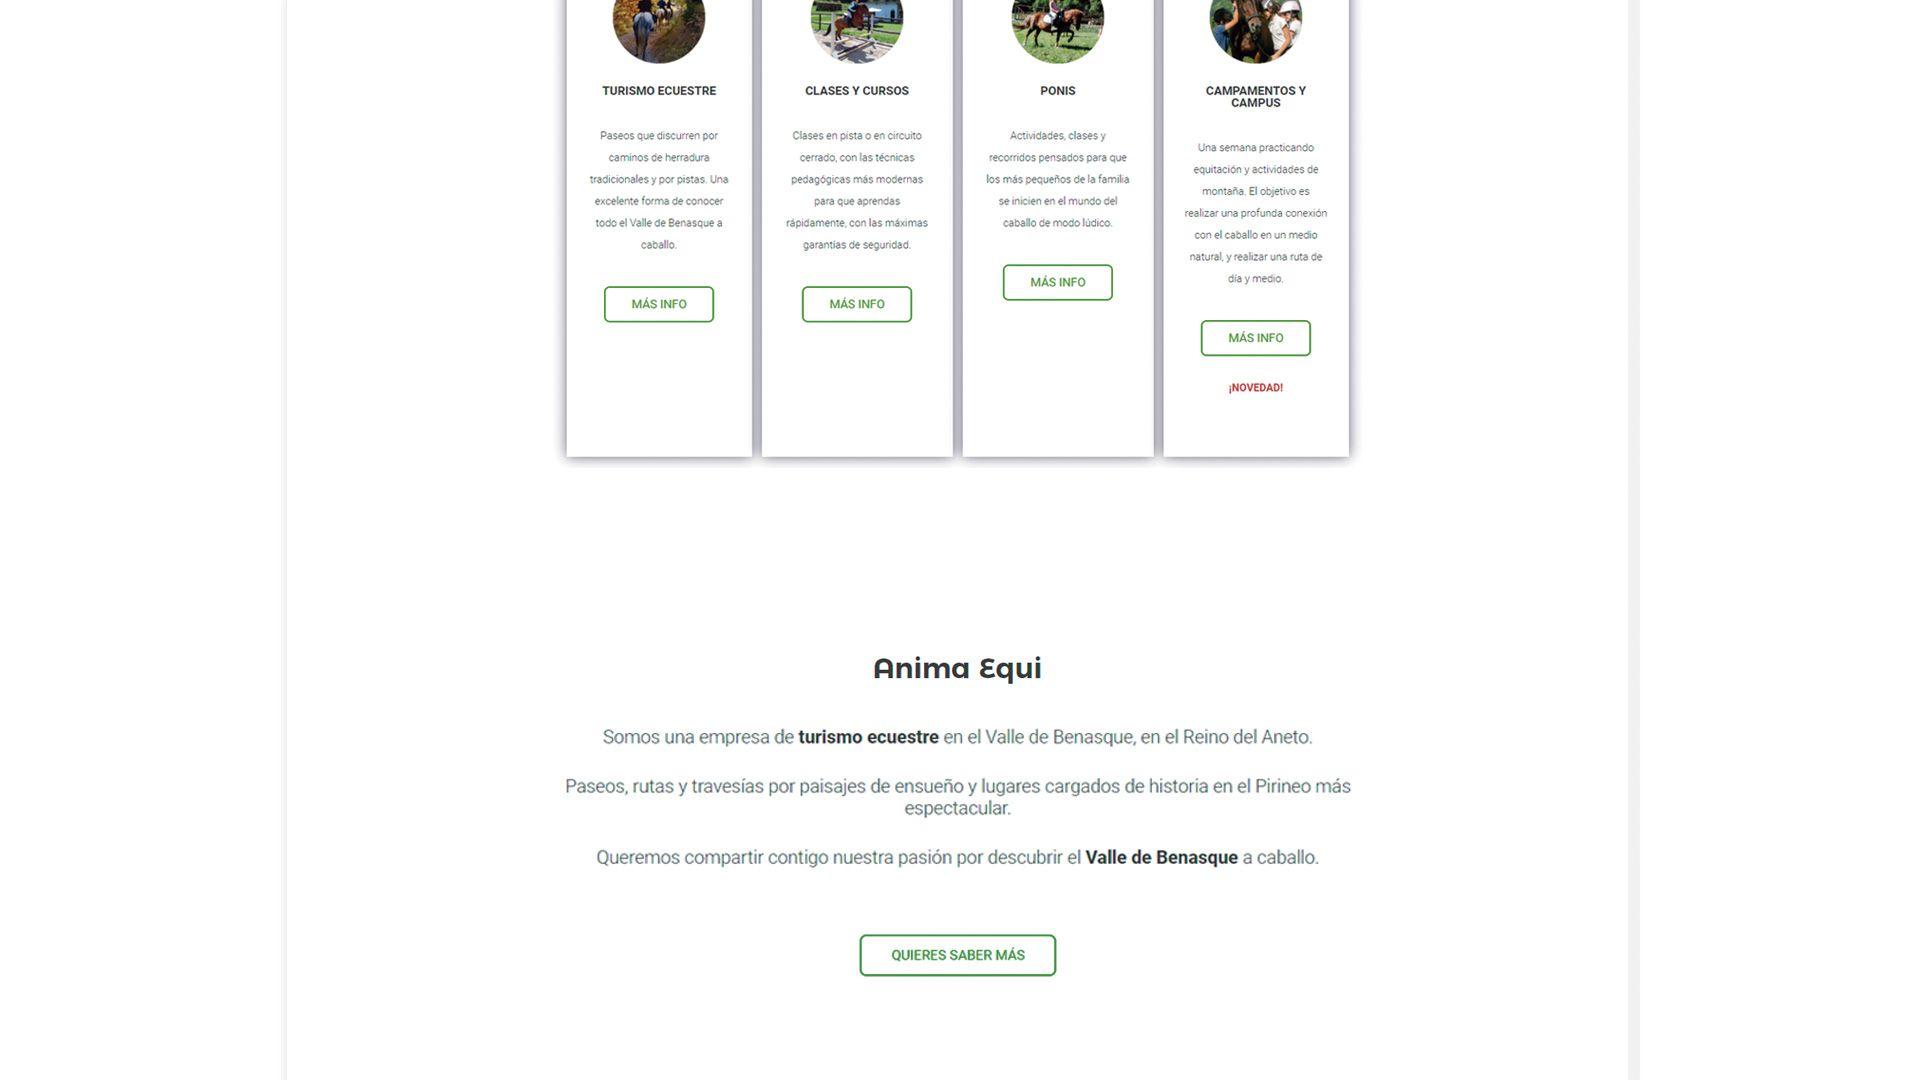 Web design turismo ecuestre Huesca Anima Equi